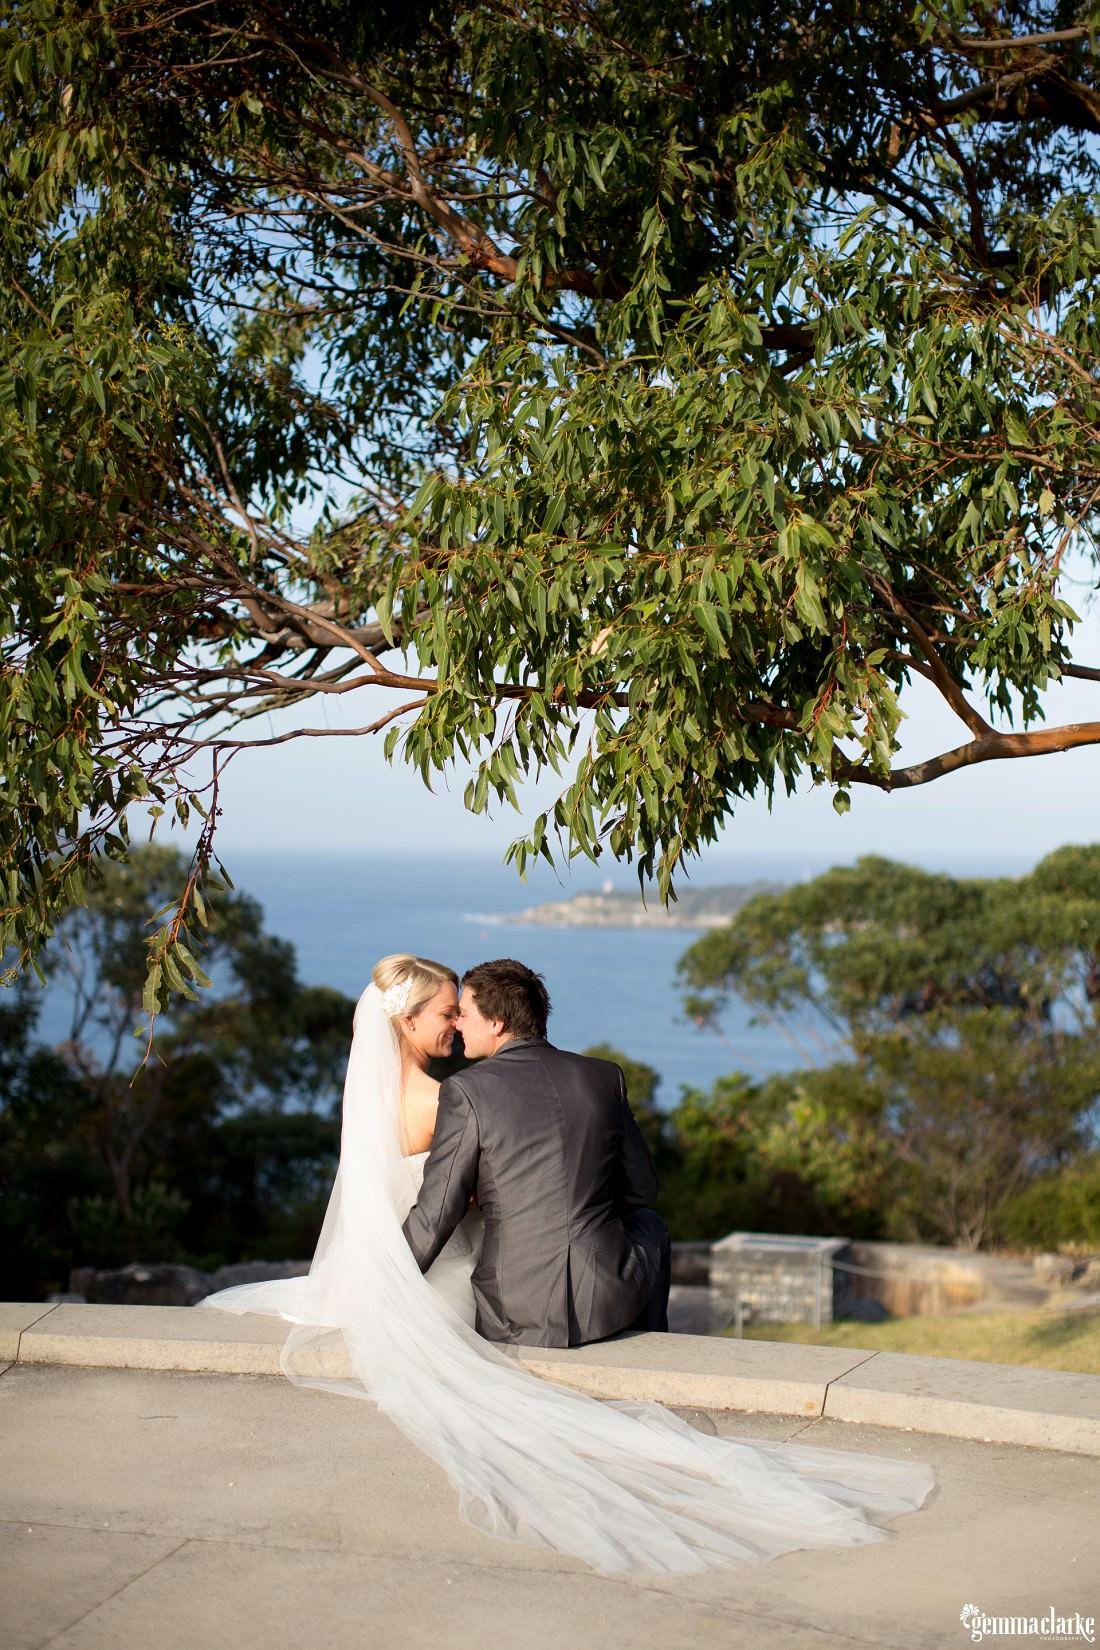 gemma-clarke-photography_gunners-barracks-wedding_tearooms-wedding_ellie-and-sam_0040